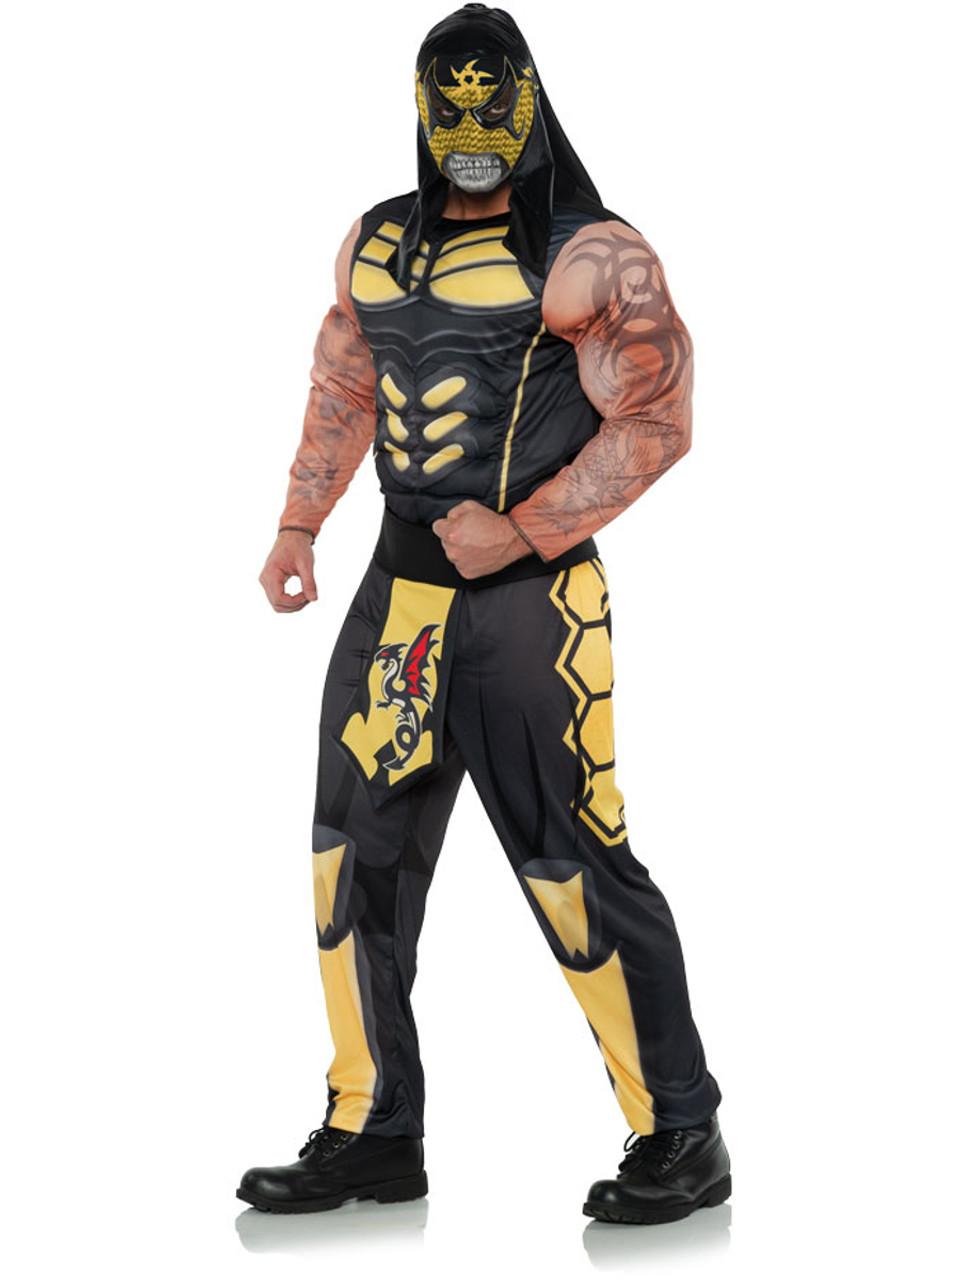 Legends Of Lucha Libre Penta Zero Boys Costume